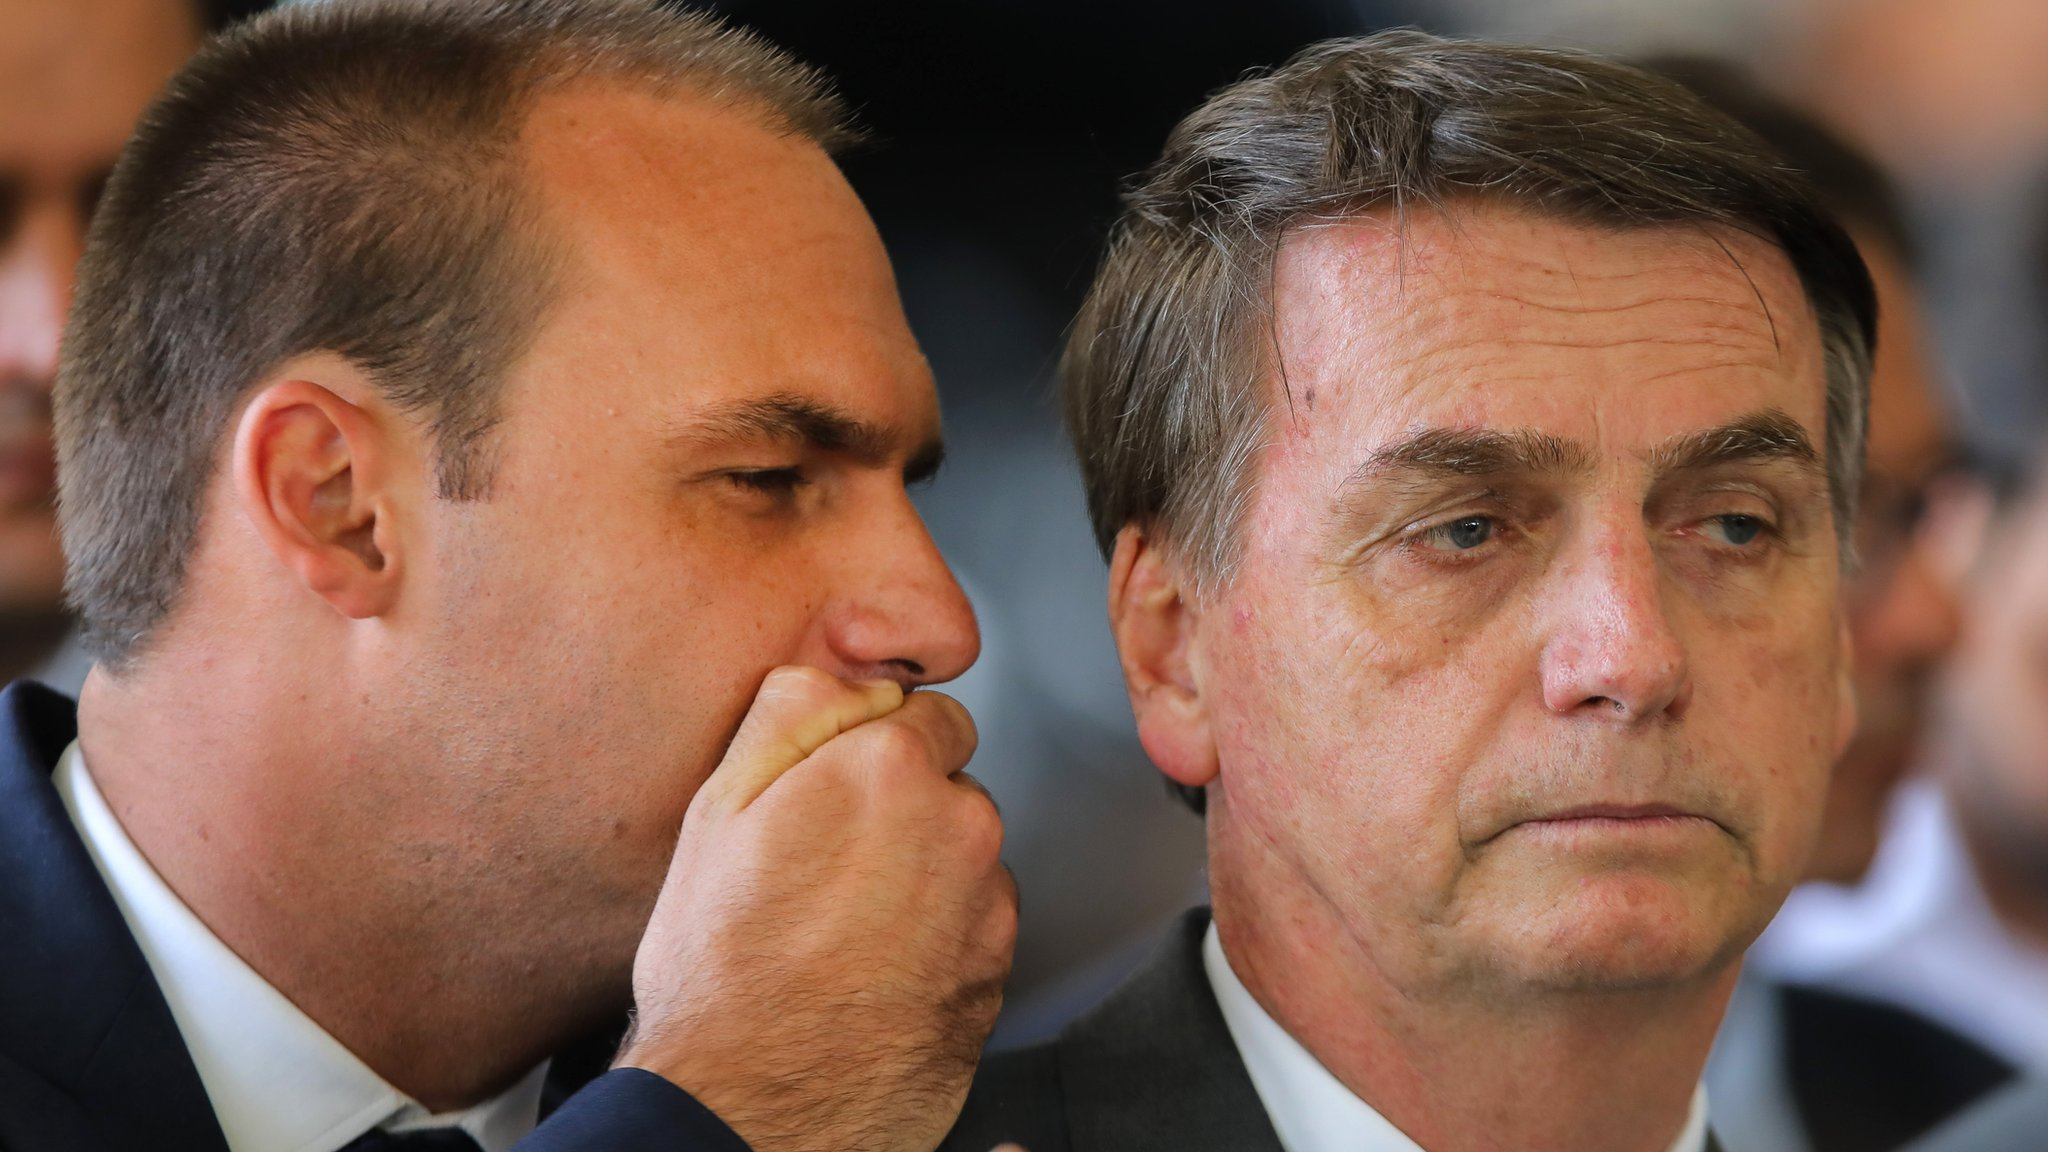 Eduardo whispering to his father, Jair Bolsonaro, at a conference in November